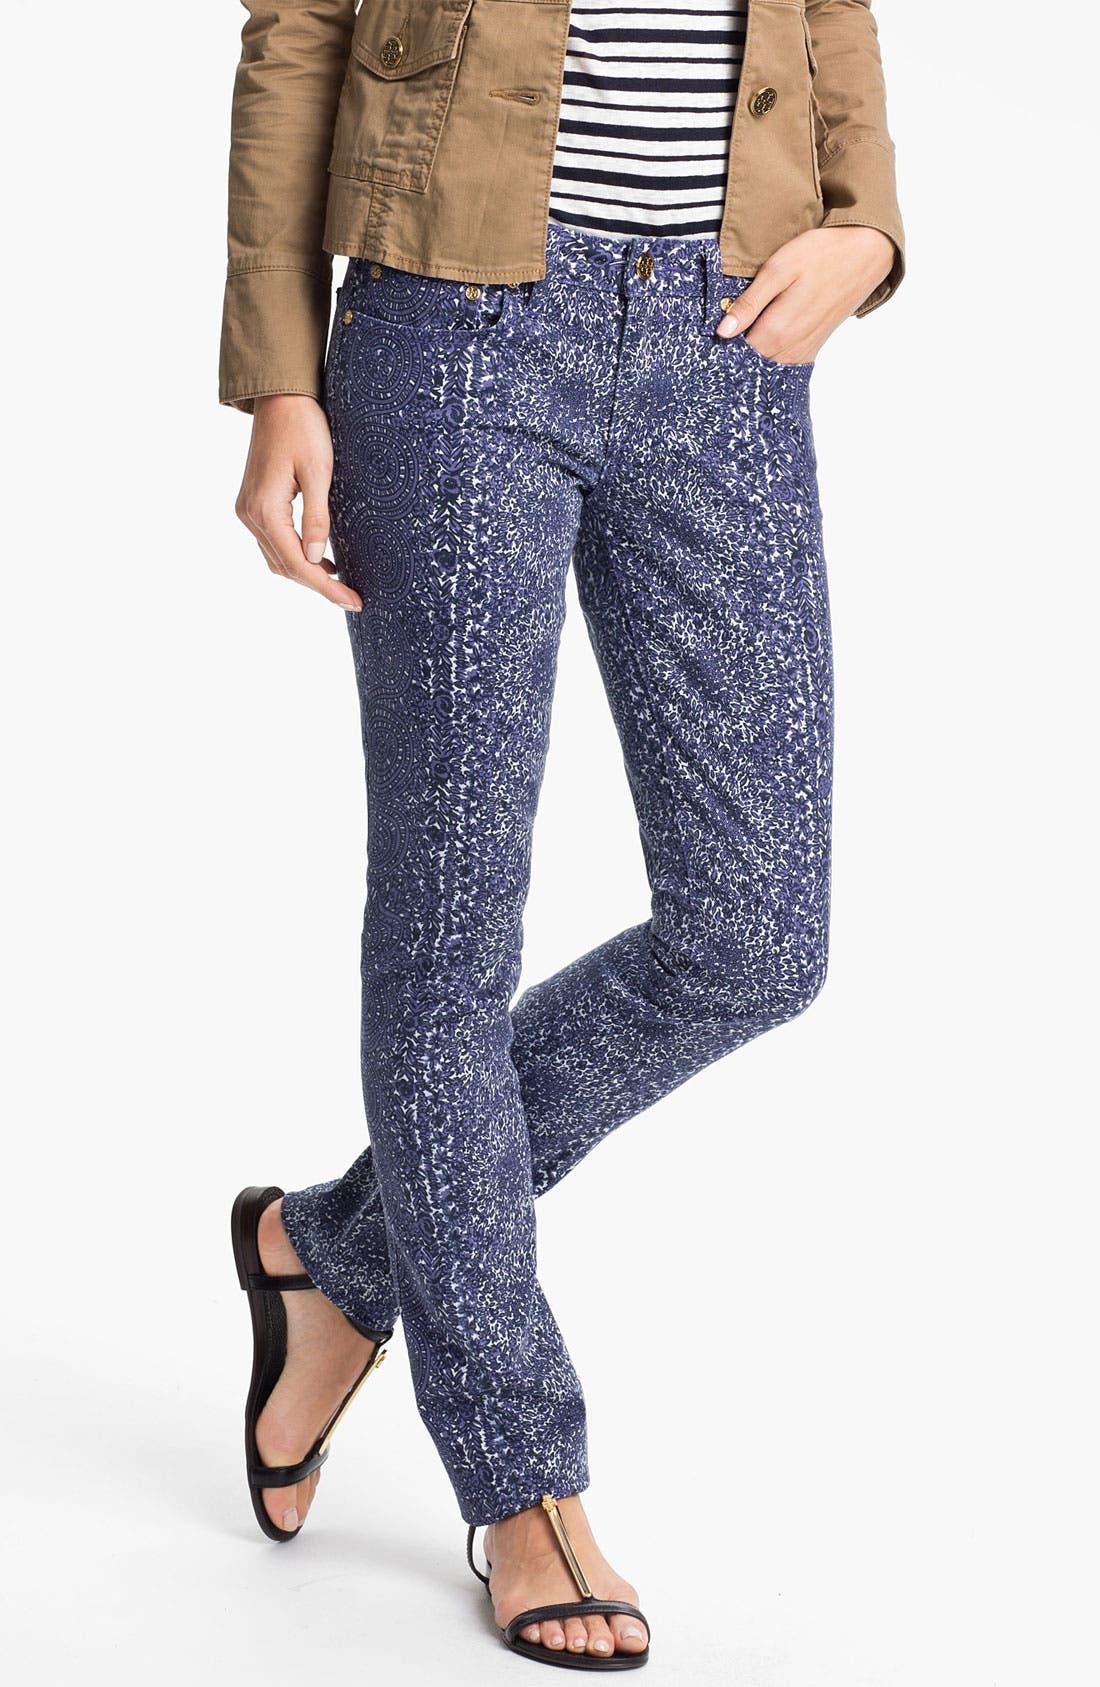 Alternate Image 1 Selected - Tory Burch 'Ivy' Print Skinny Jean